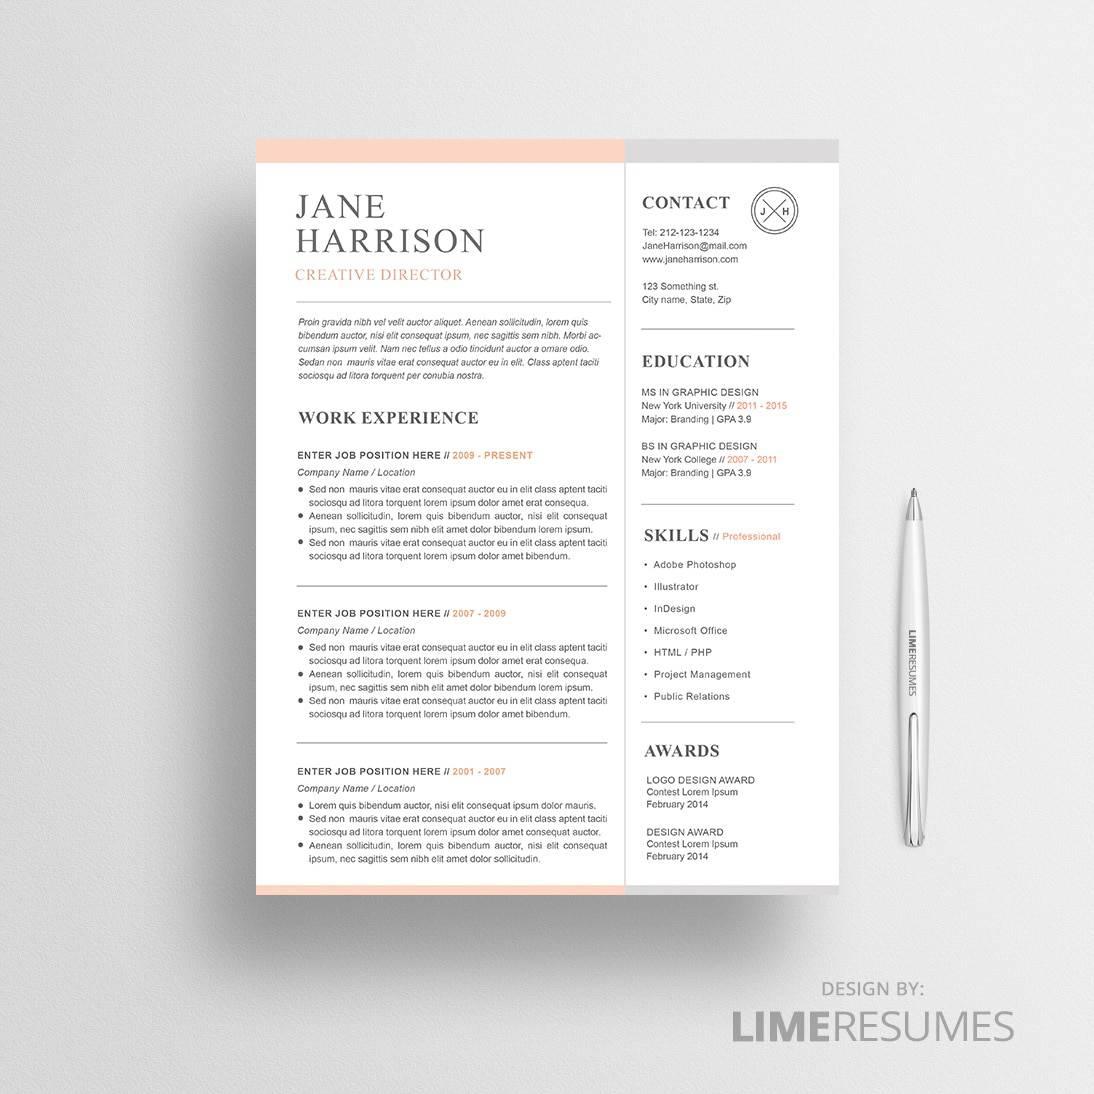 Modern Resume Template / 2 Page Resume - LimeResumes